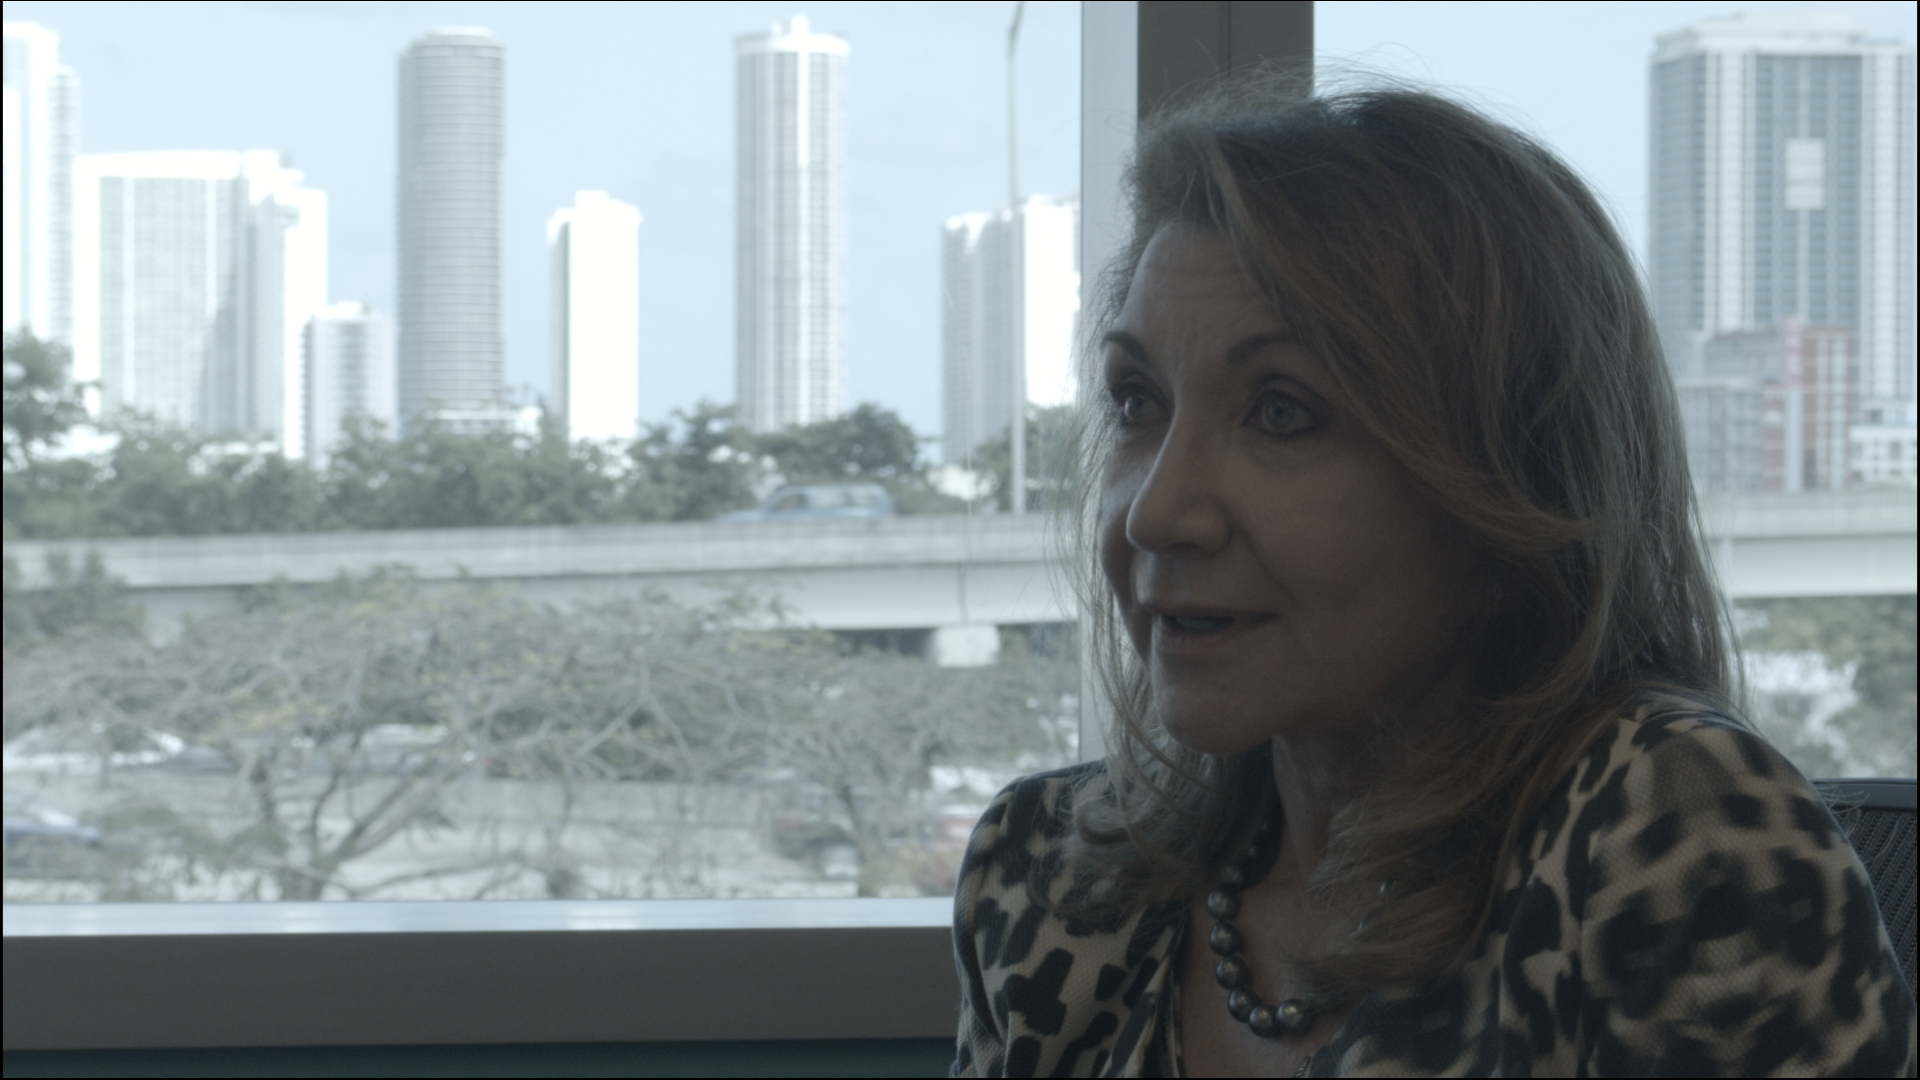 Dr. Deborah Mash